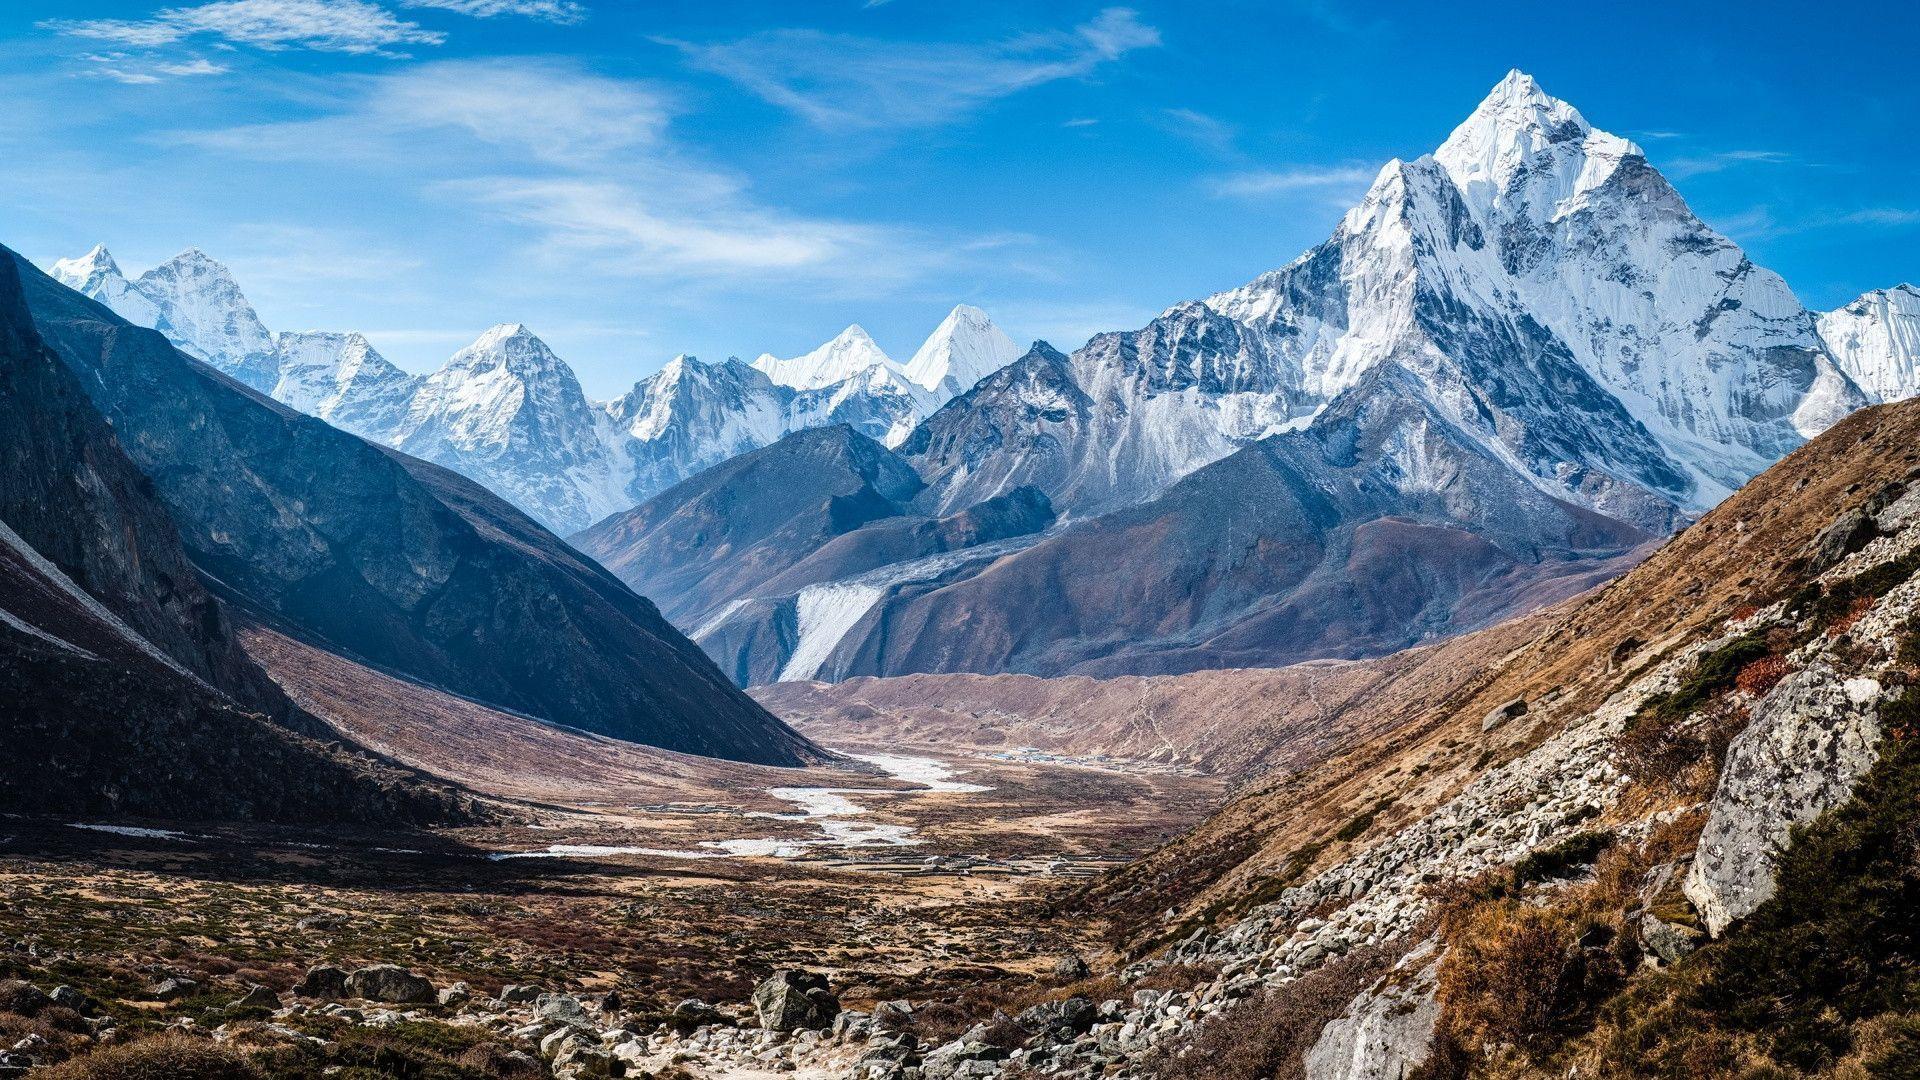 Wallpapers Of Himalayas Wallpaper Cave Mountain Wallpaper K2